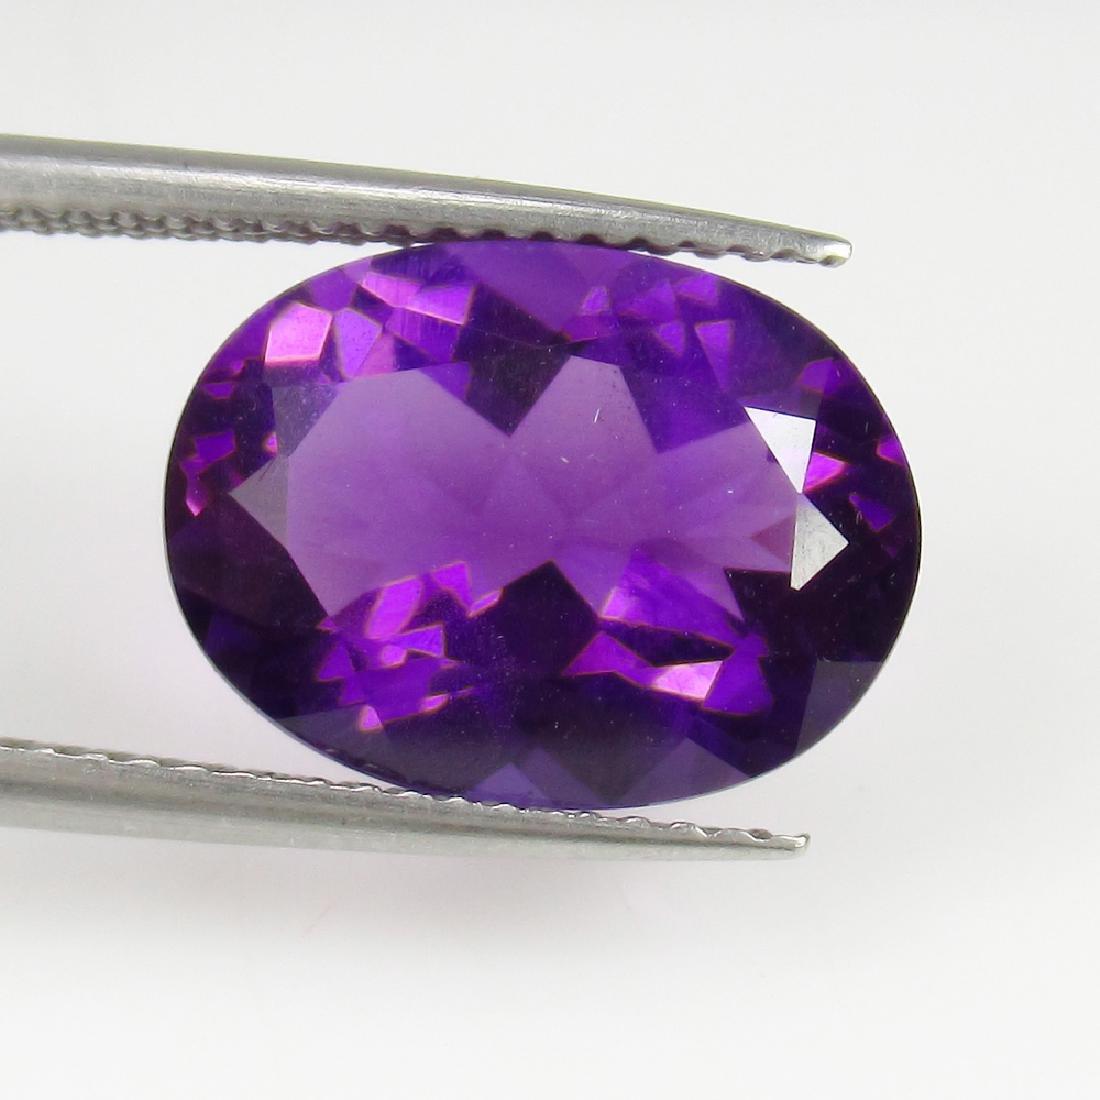 4.79 Ct IGI Certified Genuine Brazil Purple Amethyst - 3